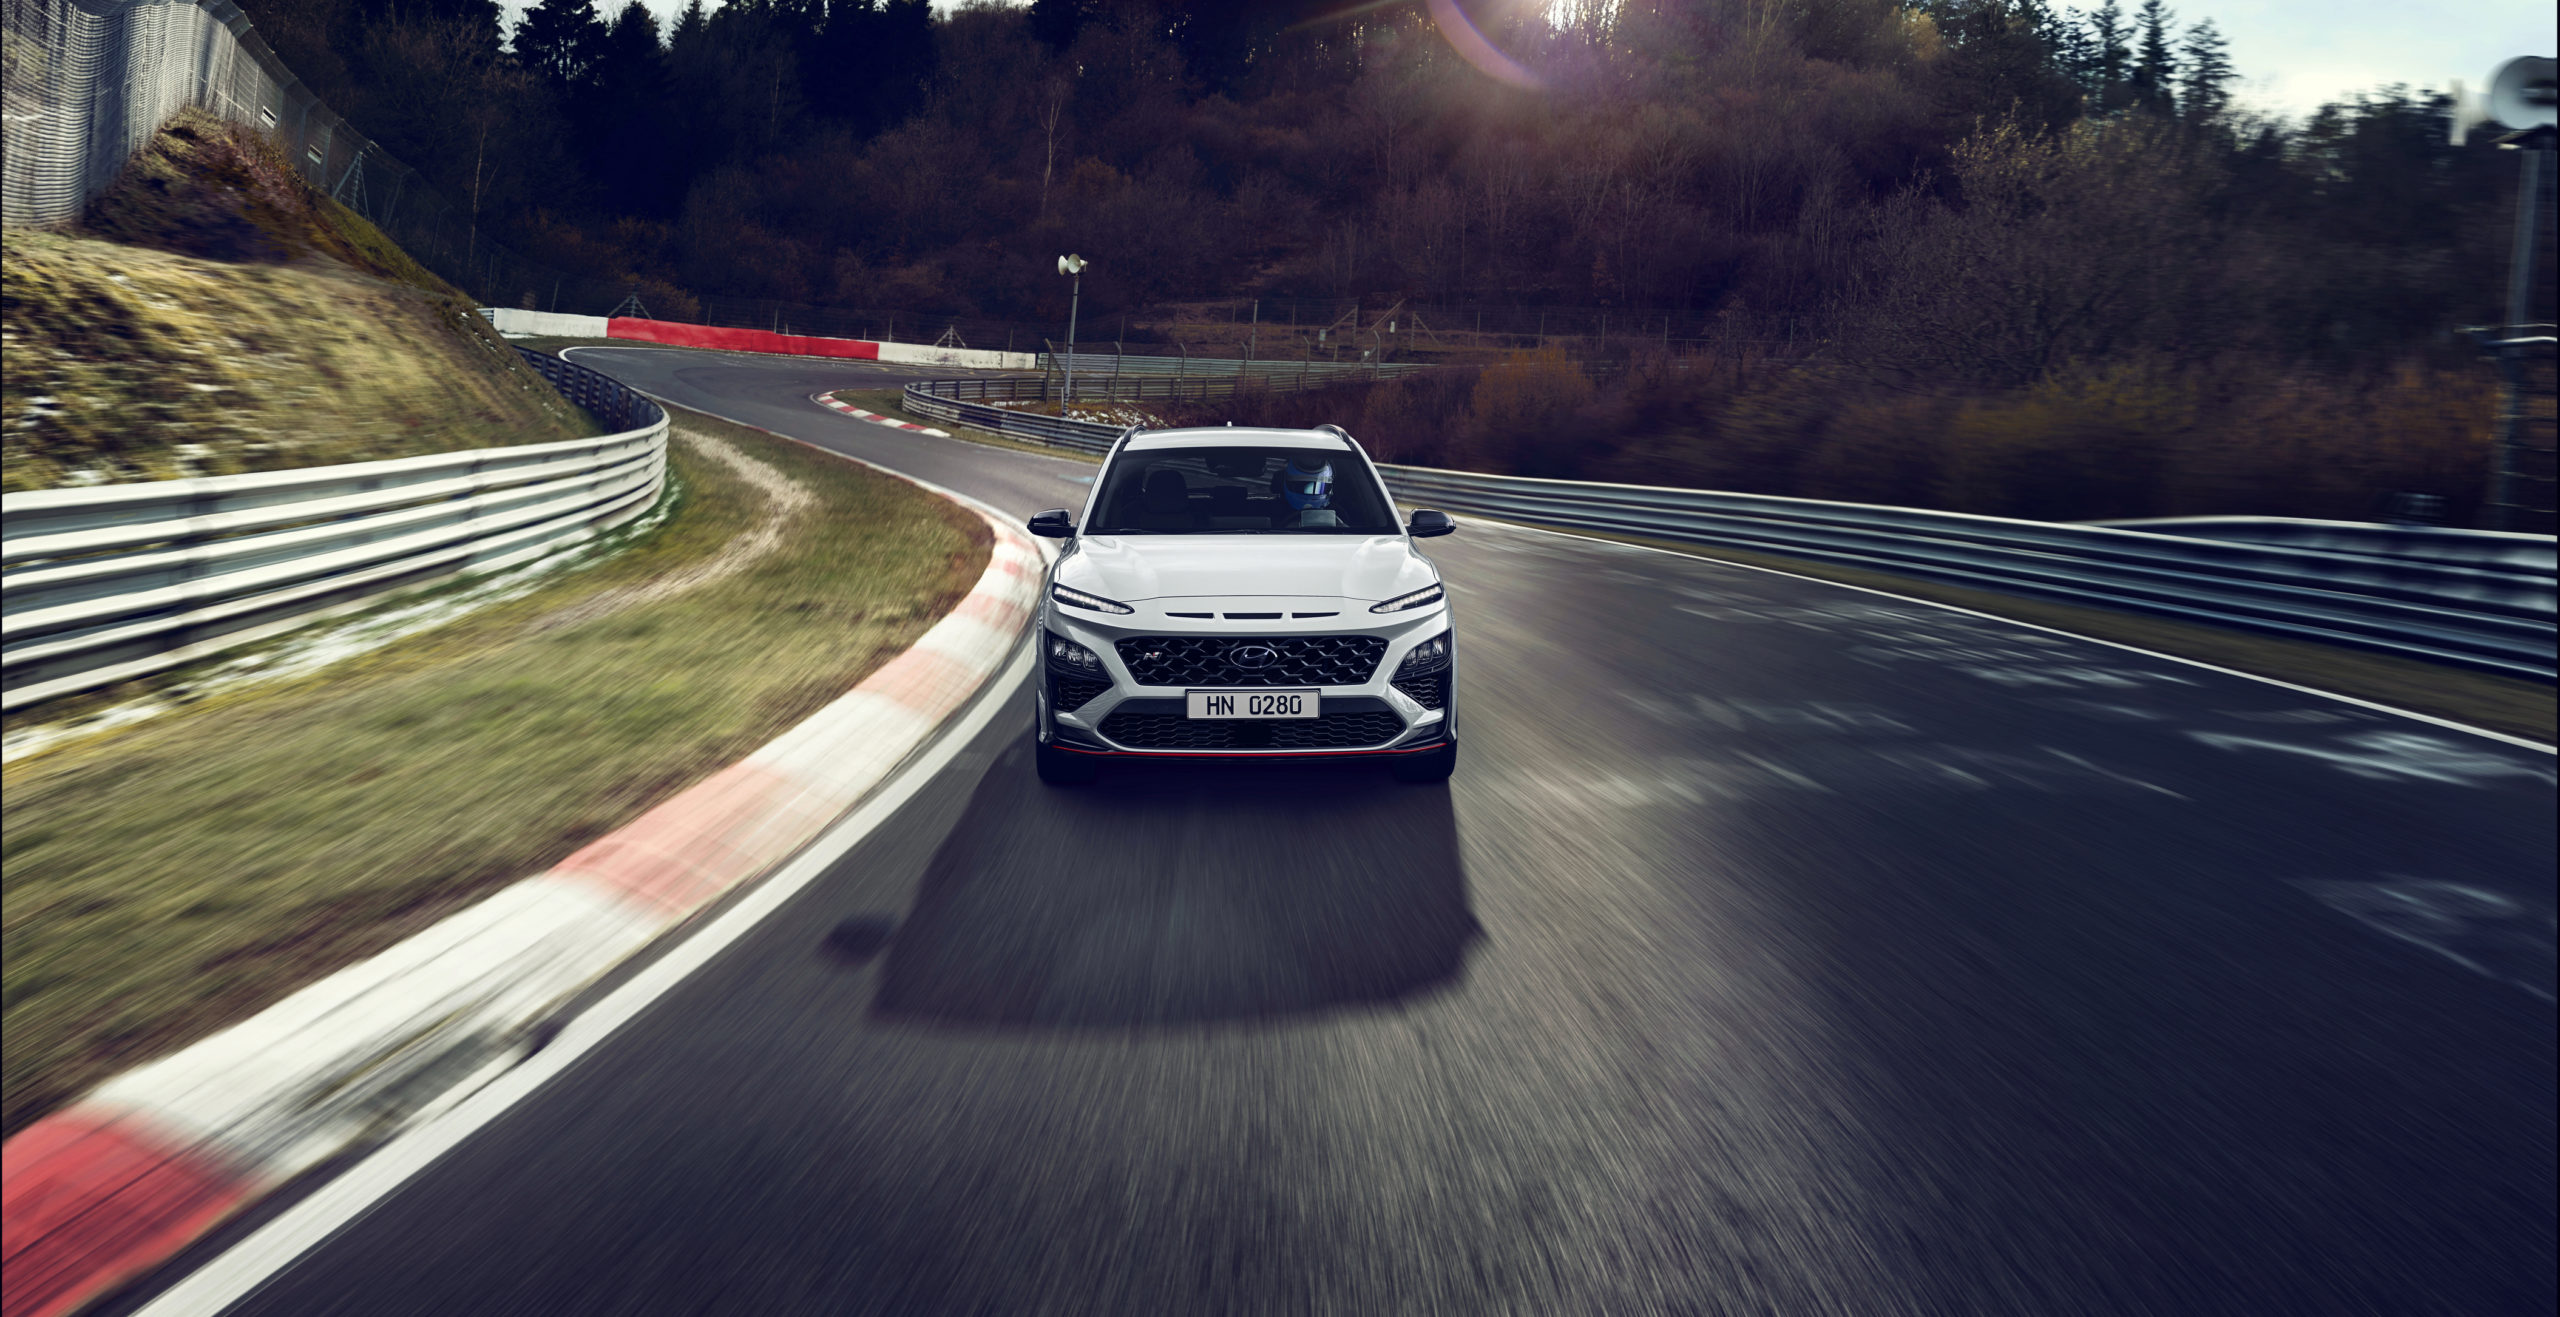 2021 Hyundai Kona N: 10 things about Hyundai's cut price GLA45